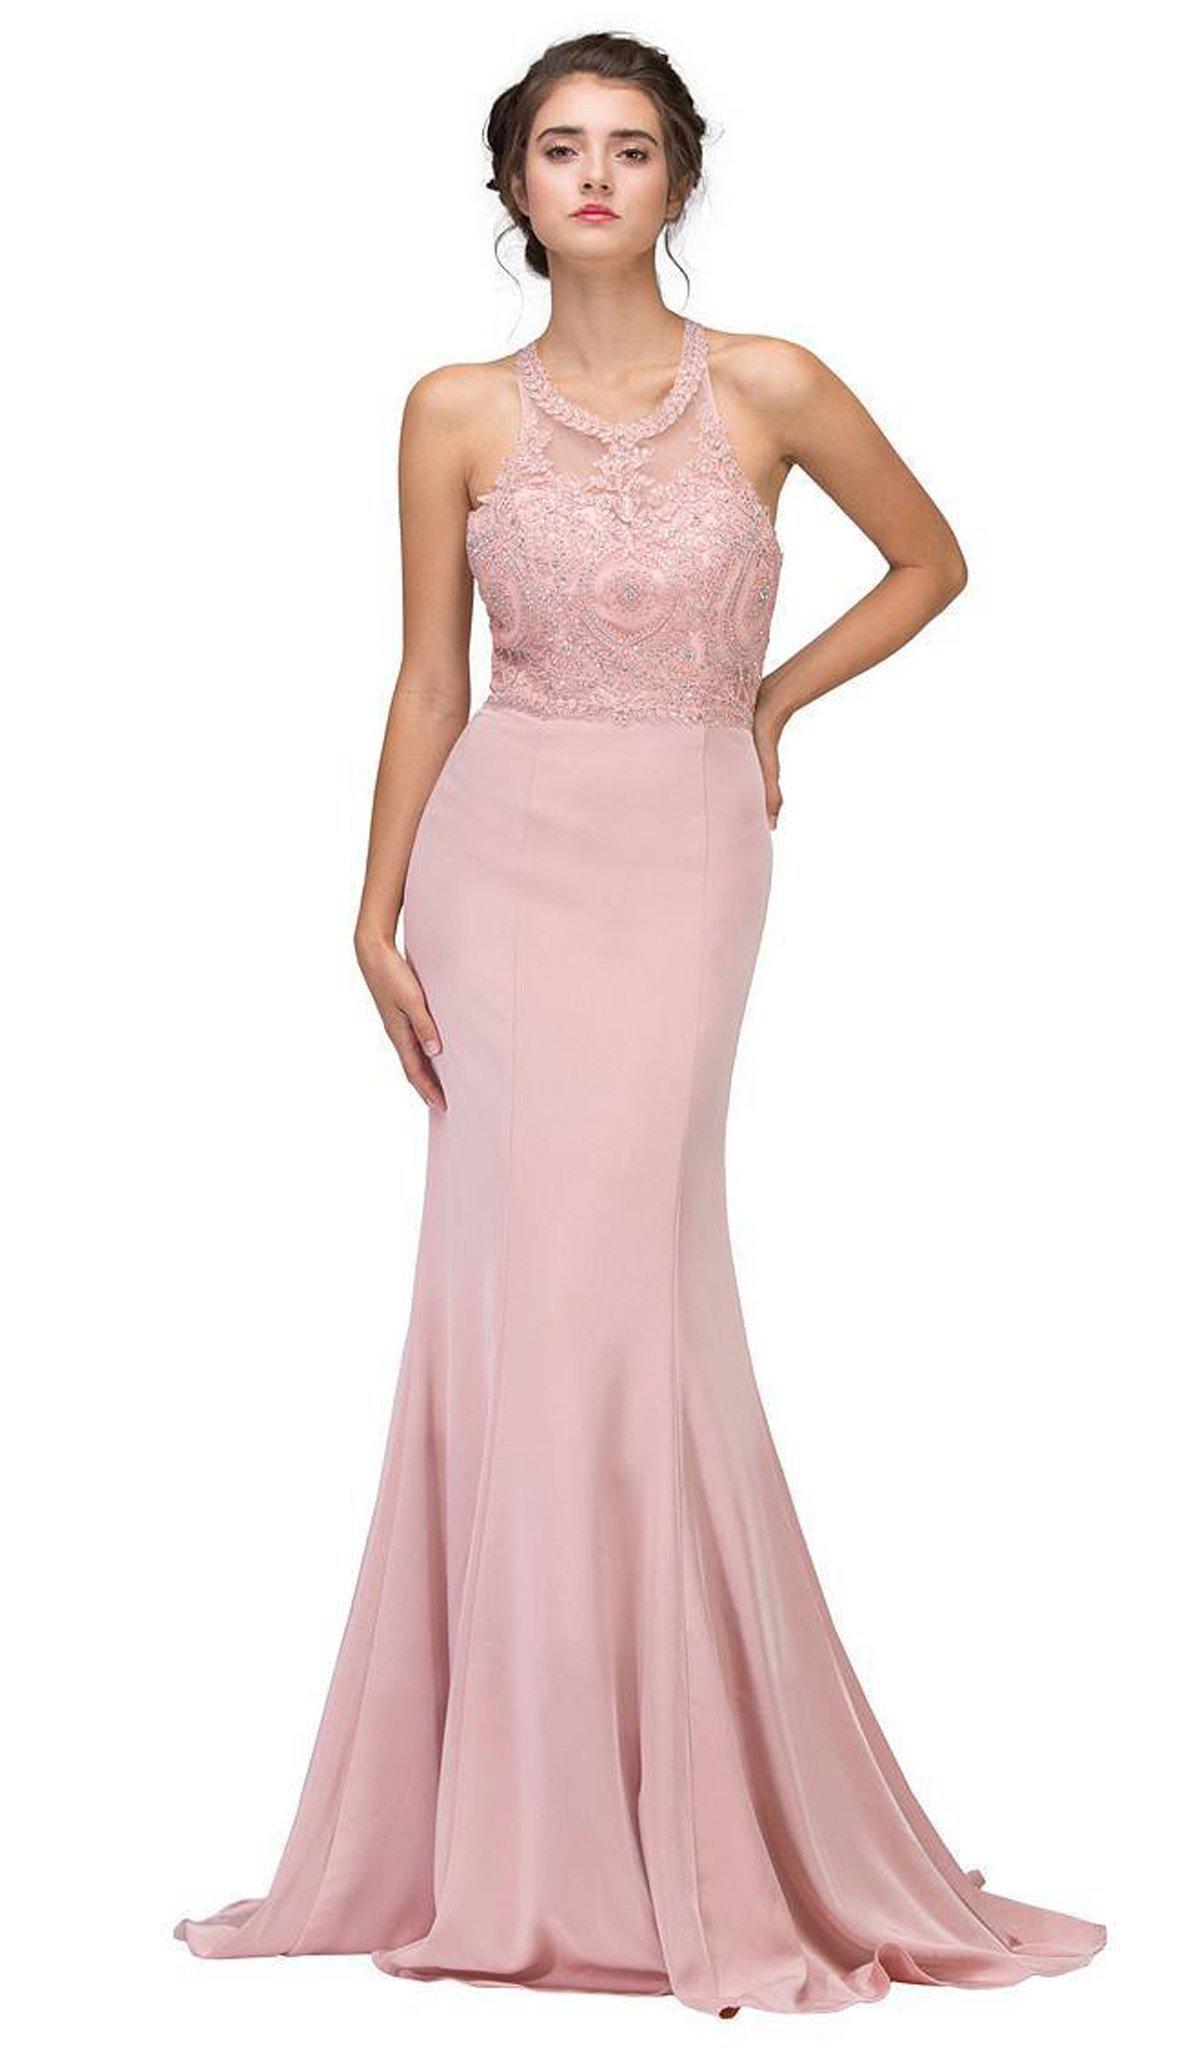 Eureka Fashion - 7133 Applique Halter Stretch Satin Trumpet Dress